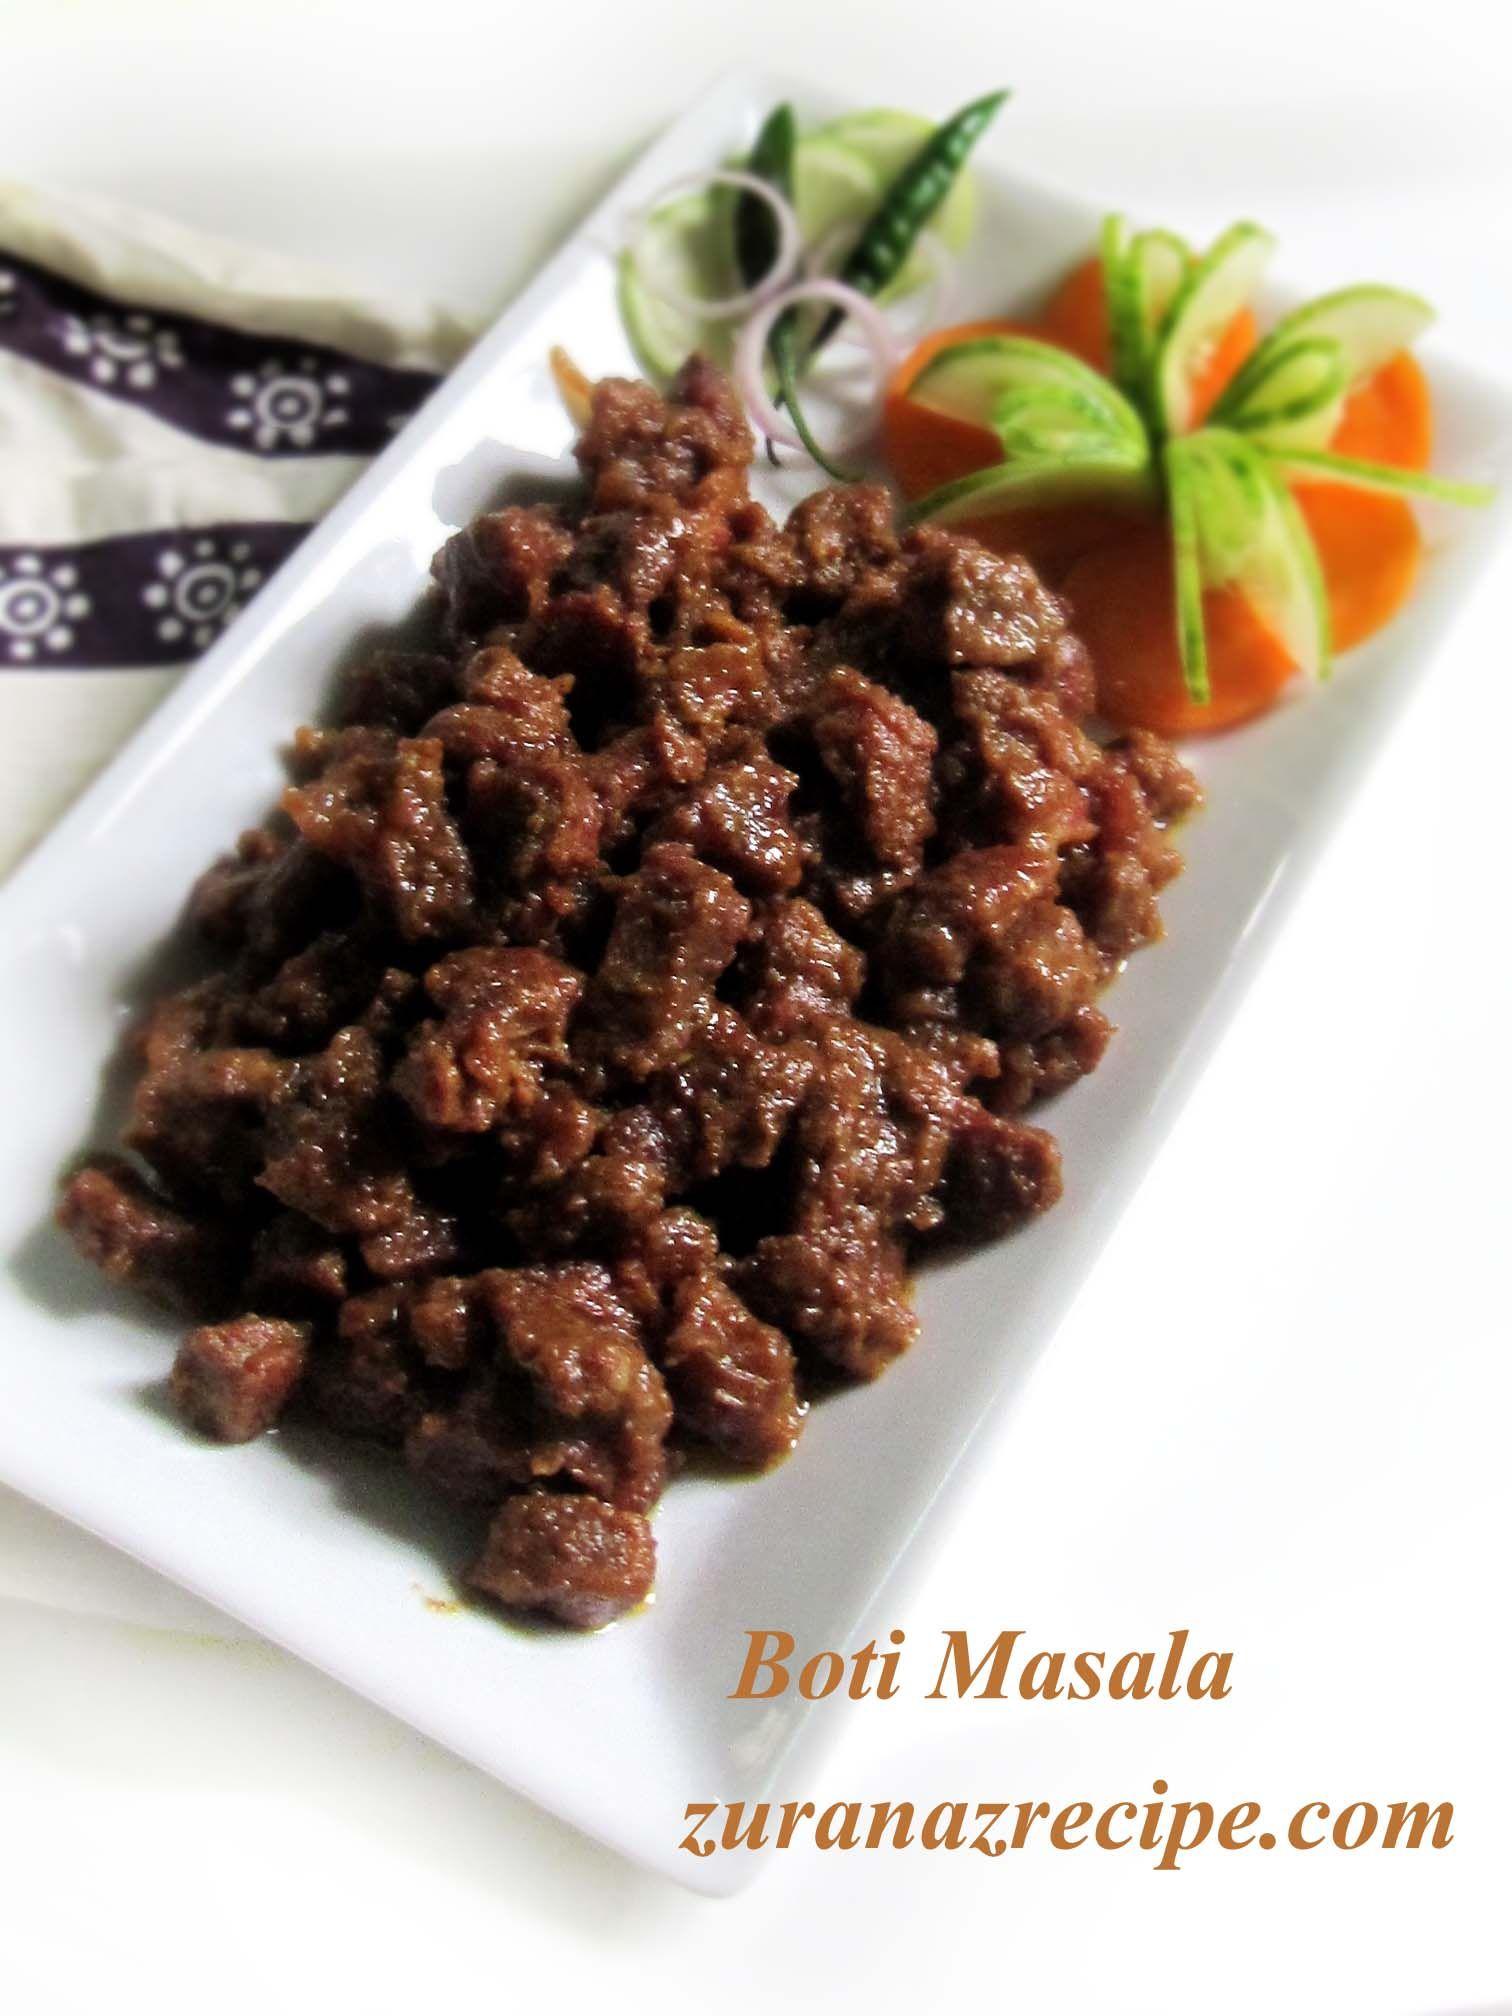 Boti masala bangla bangladeshi bengali food recipes boti masala bangla bangladeshi bengali food recipes forumfinder Images